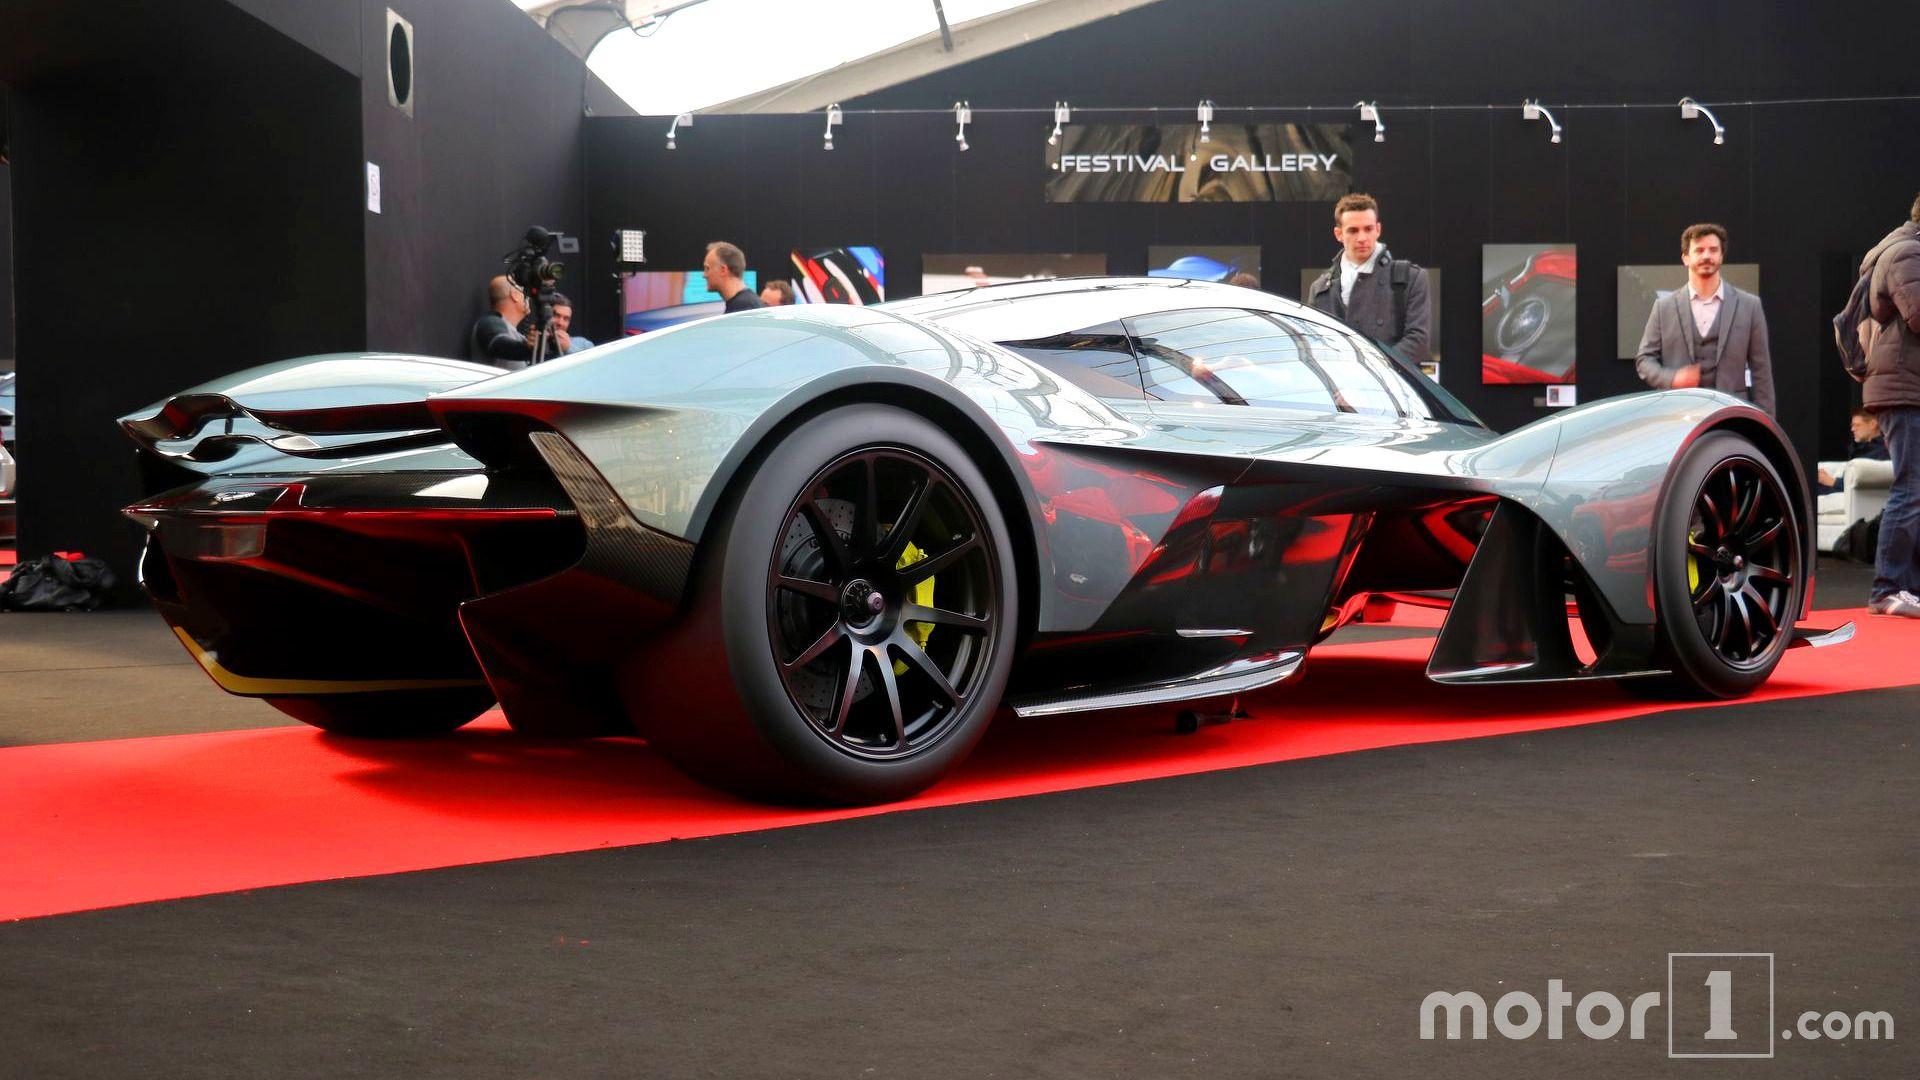 Behold The Beautiful Aston Martin Am Rb 001 Hypercar In 41 Photos